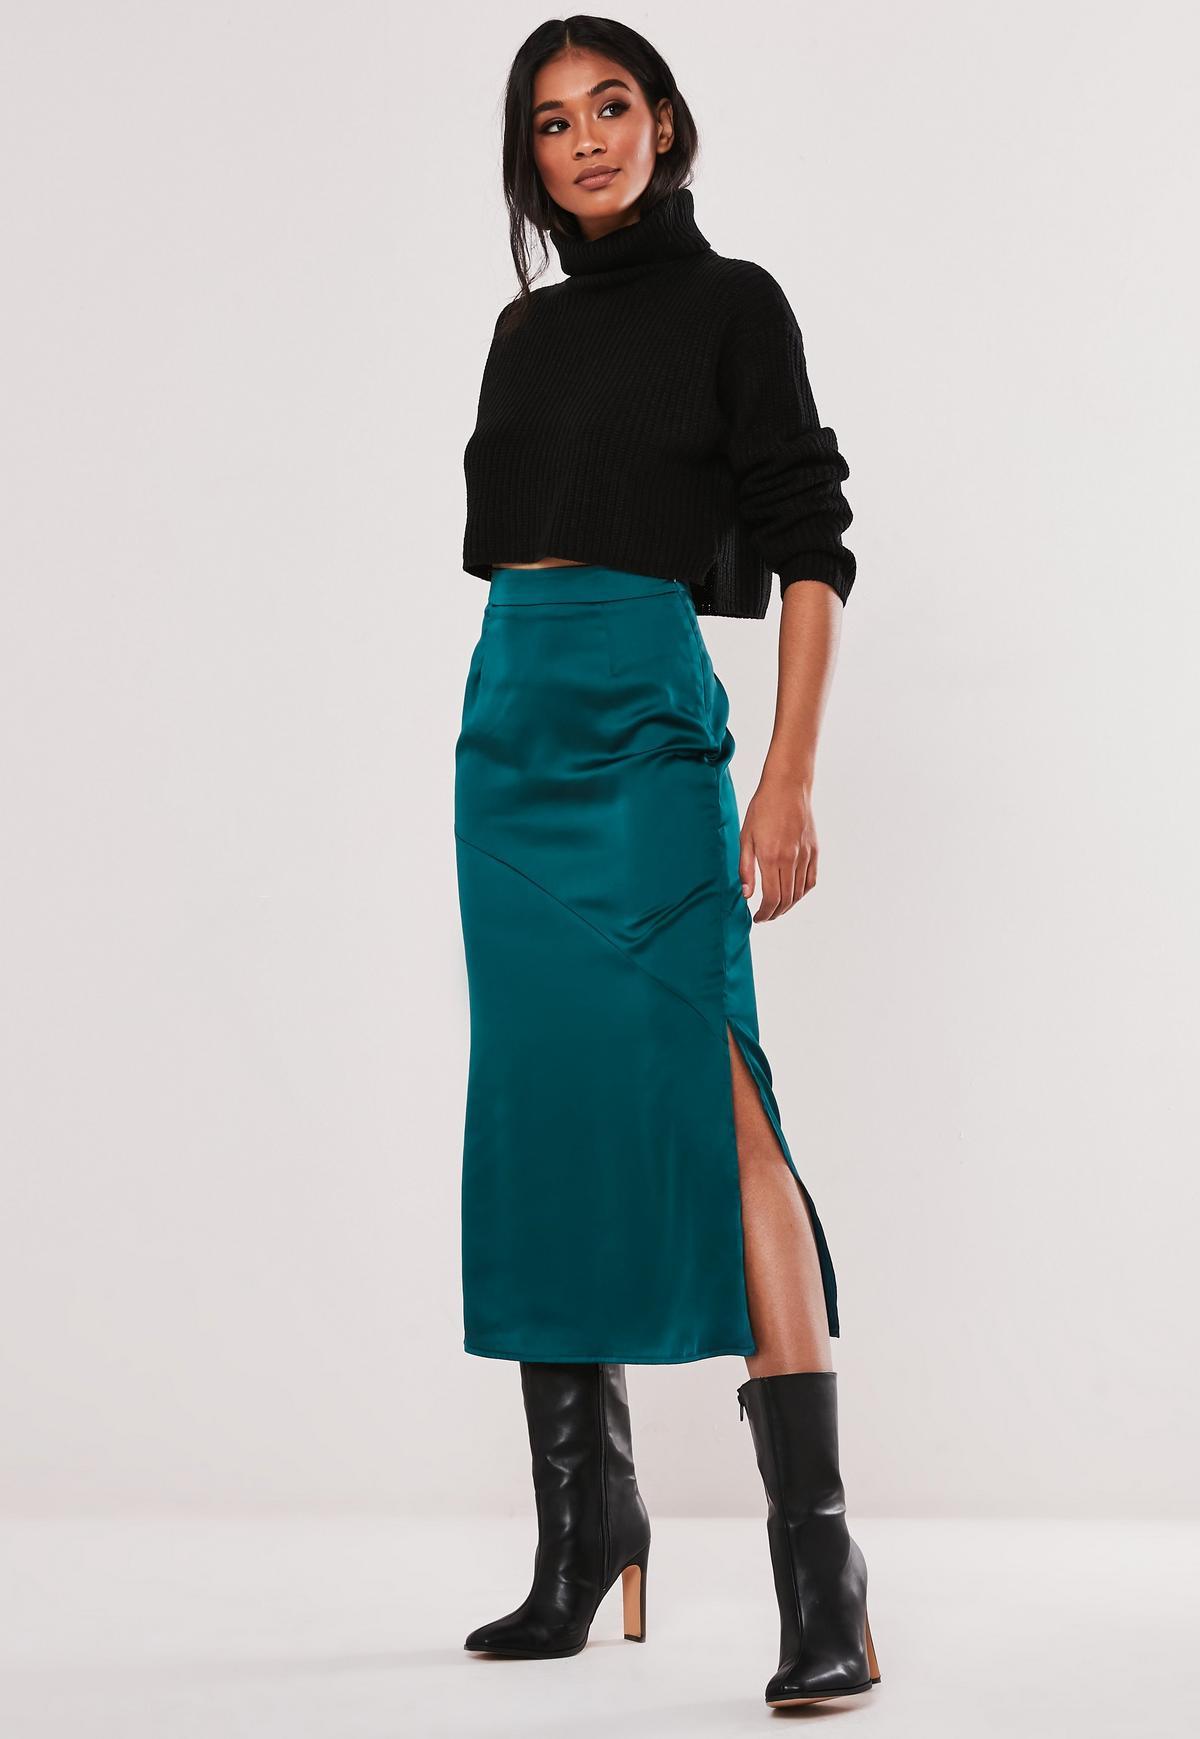 Teal Satin Midi Skirt